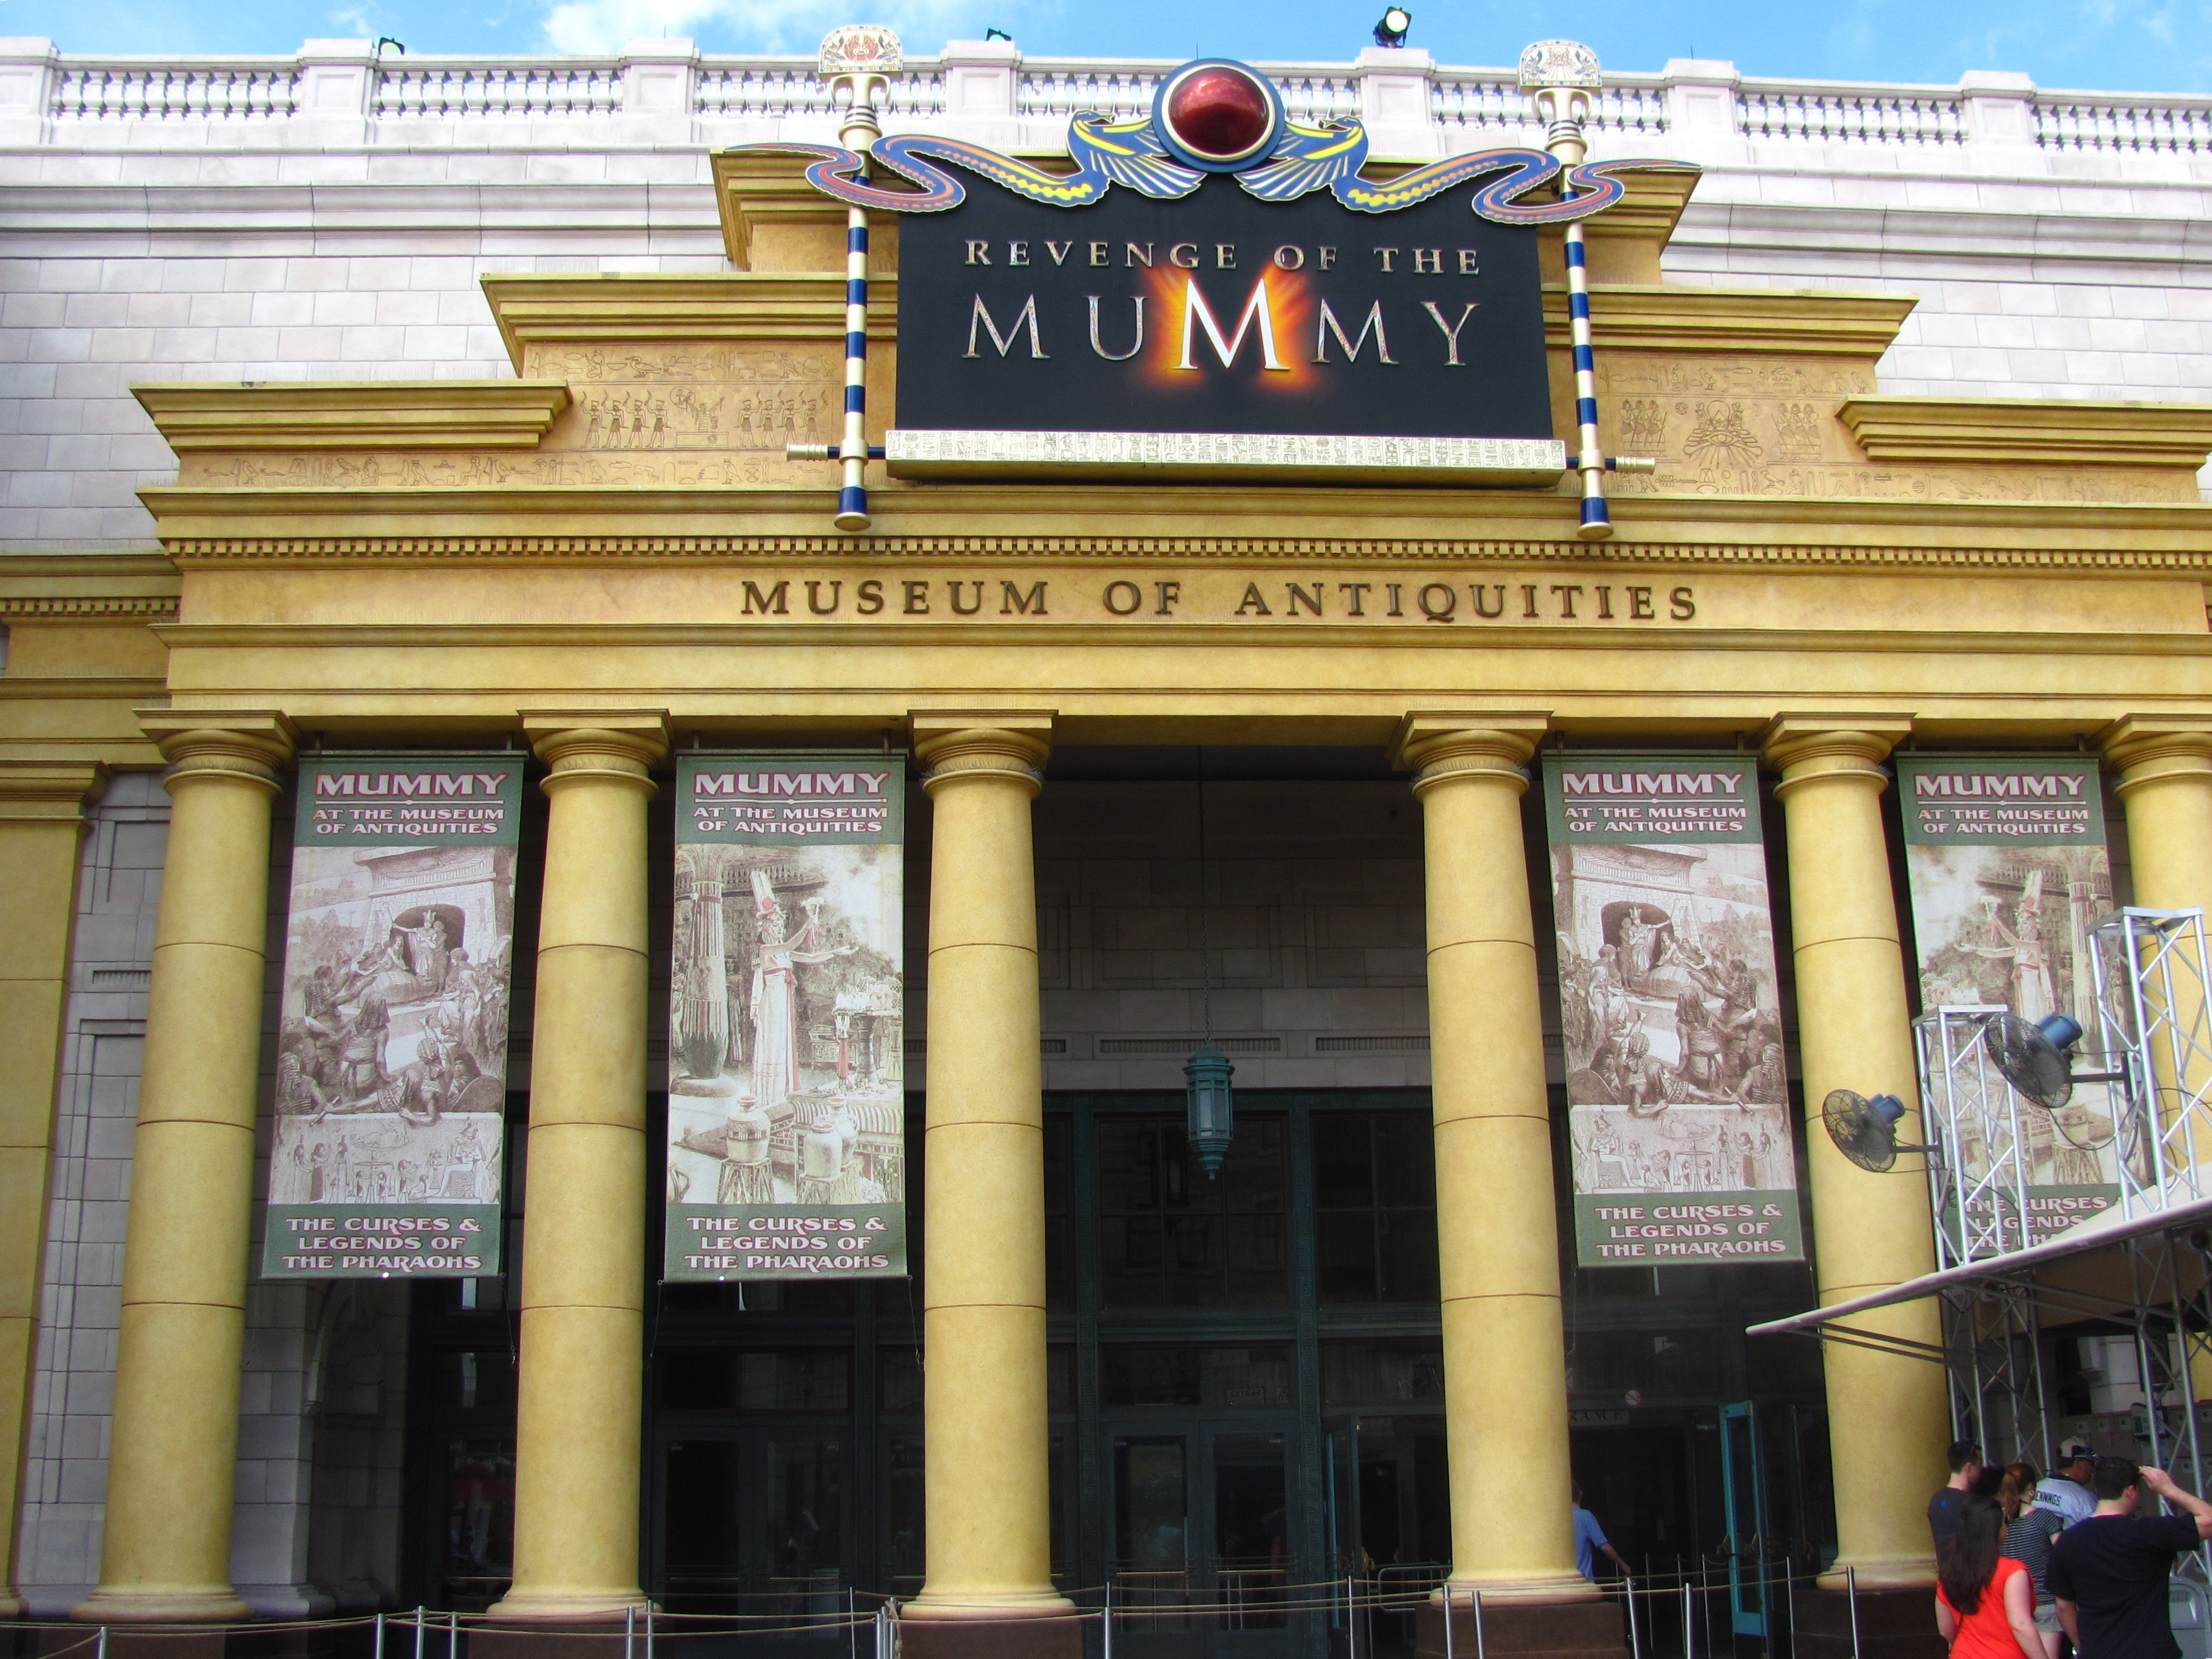 File:Revenge of the Mummy (Universal Studios Florida) facade.jpg ...